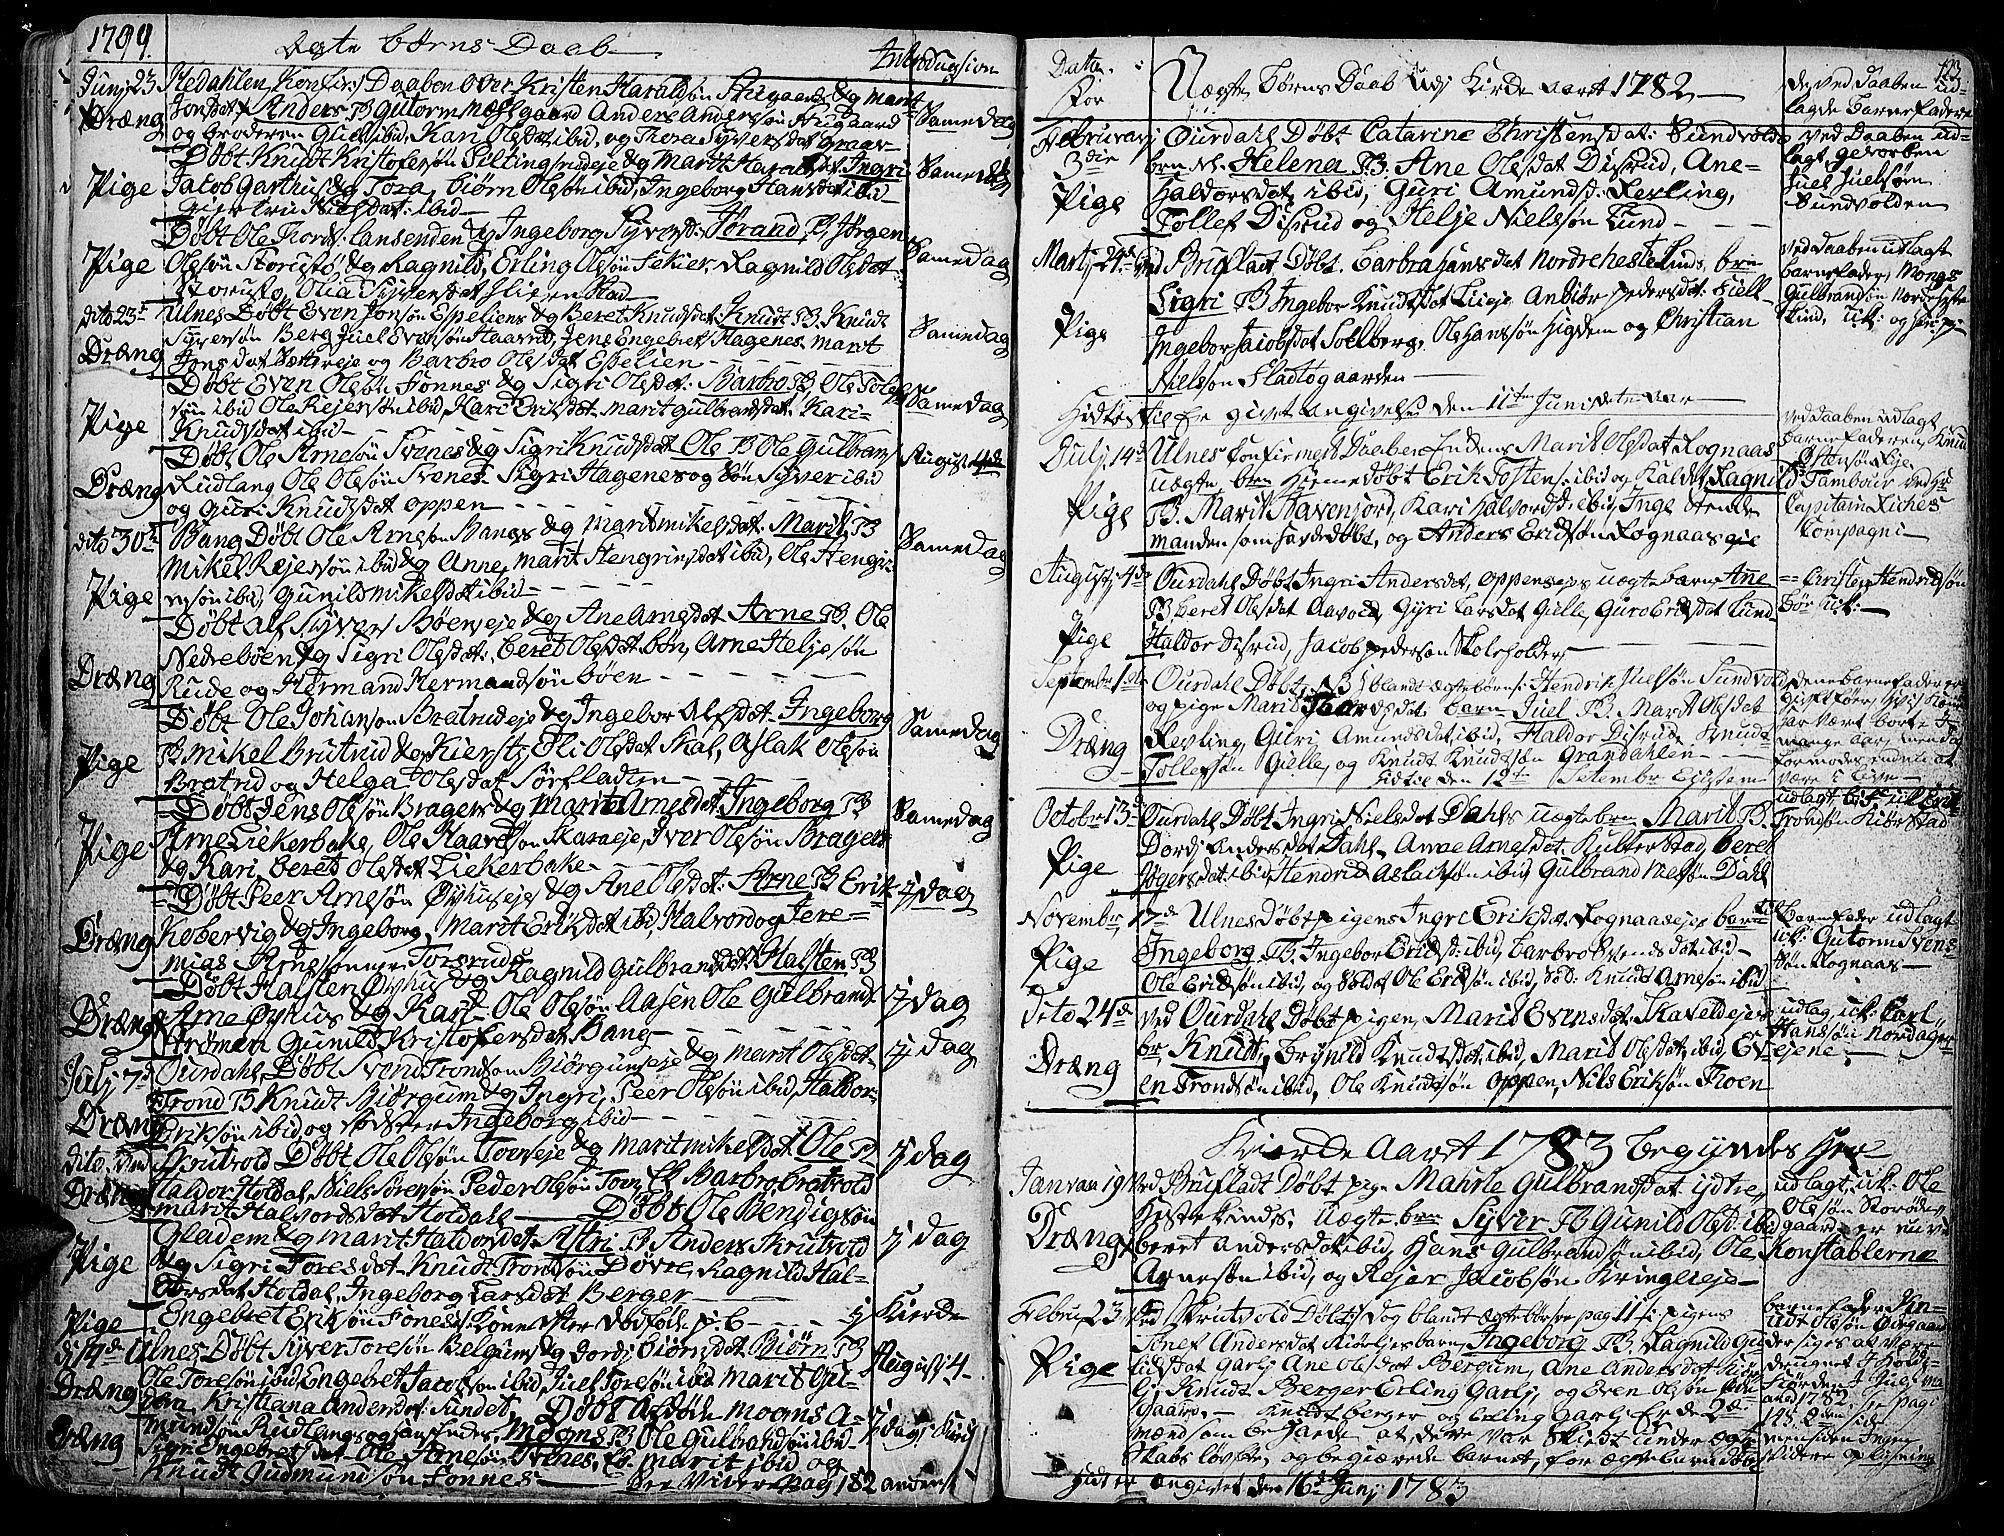 SAH, Aurdal prestekontor, Ministerialbok nr. 6, 1781-1804, s. 123